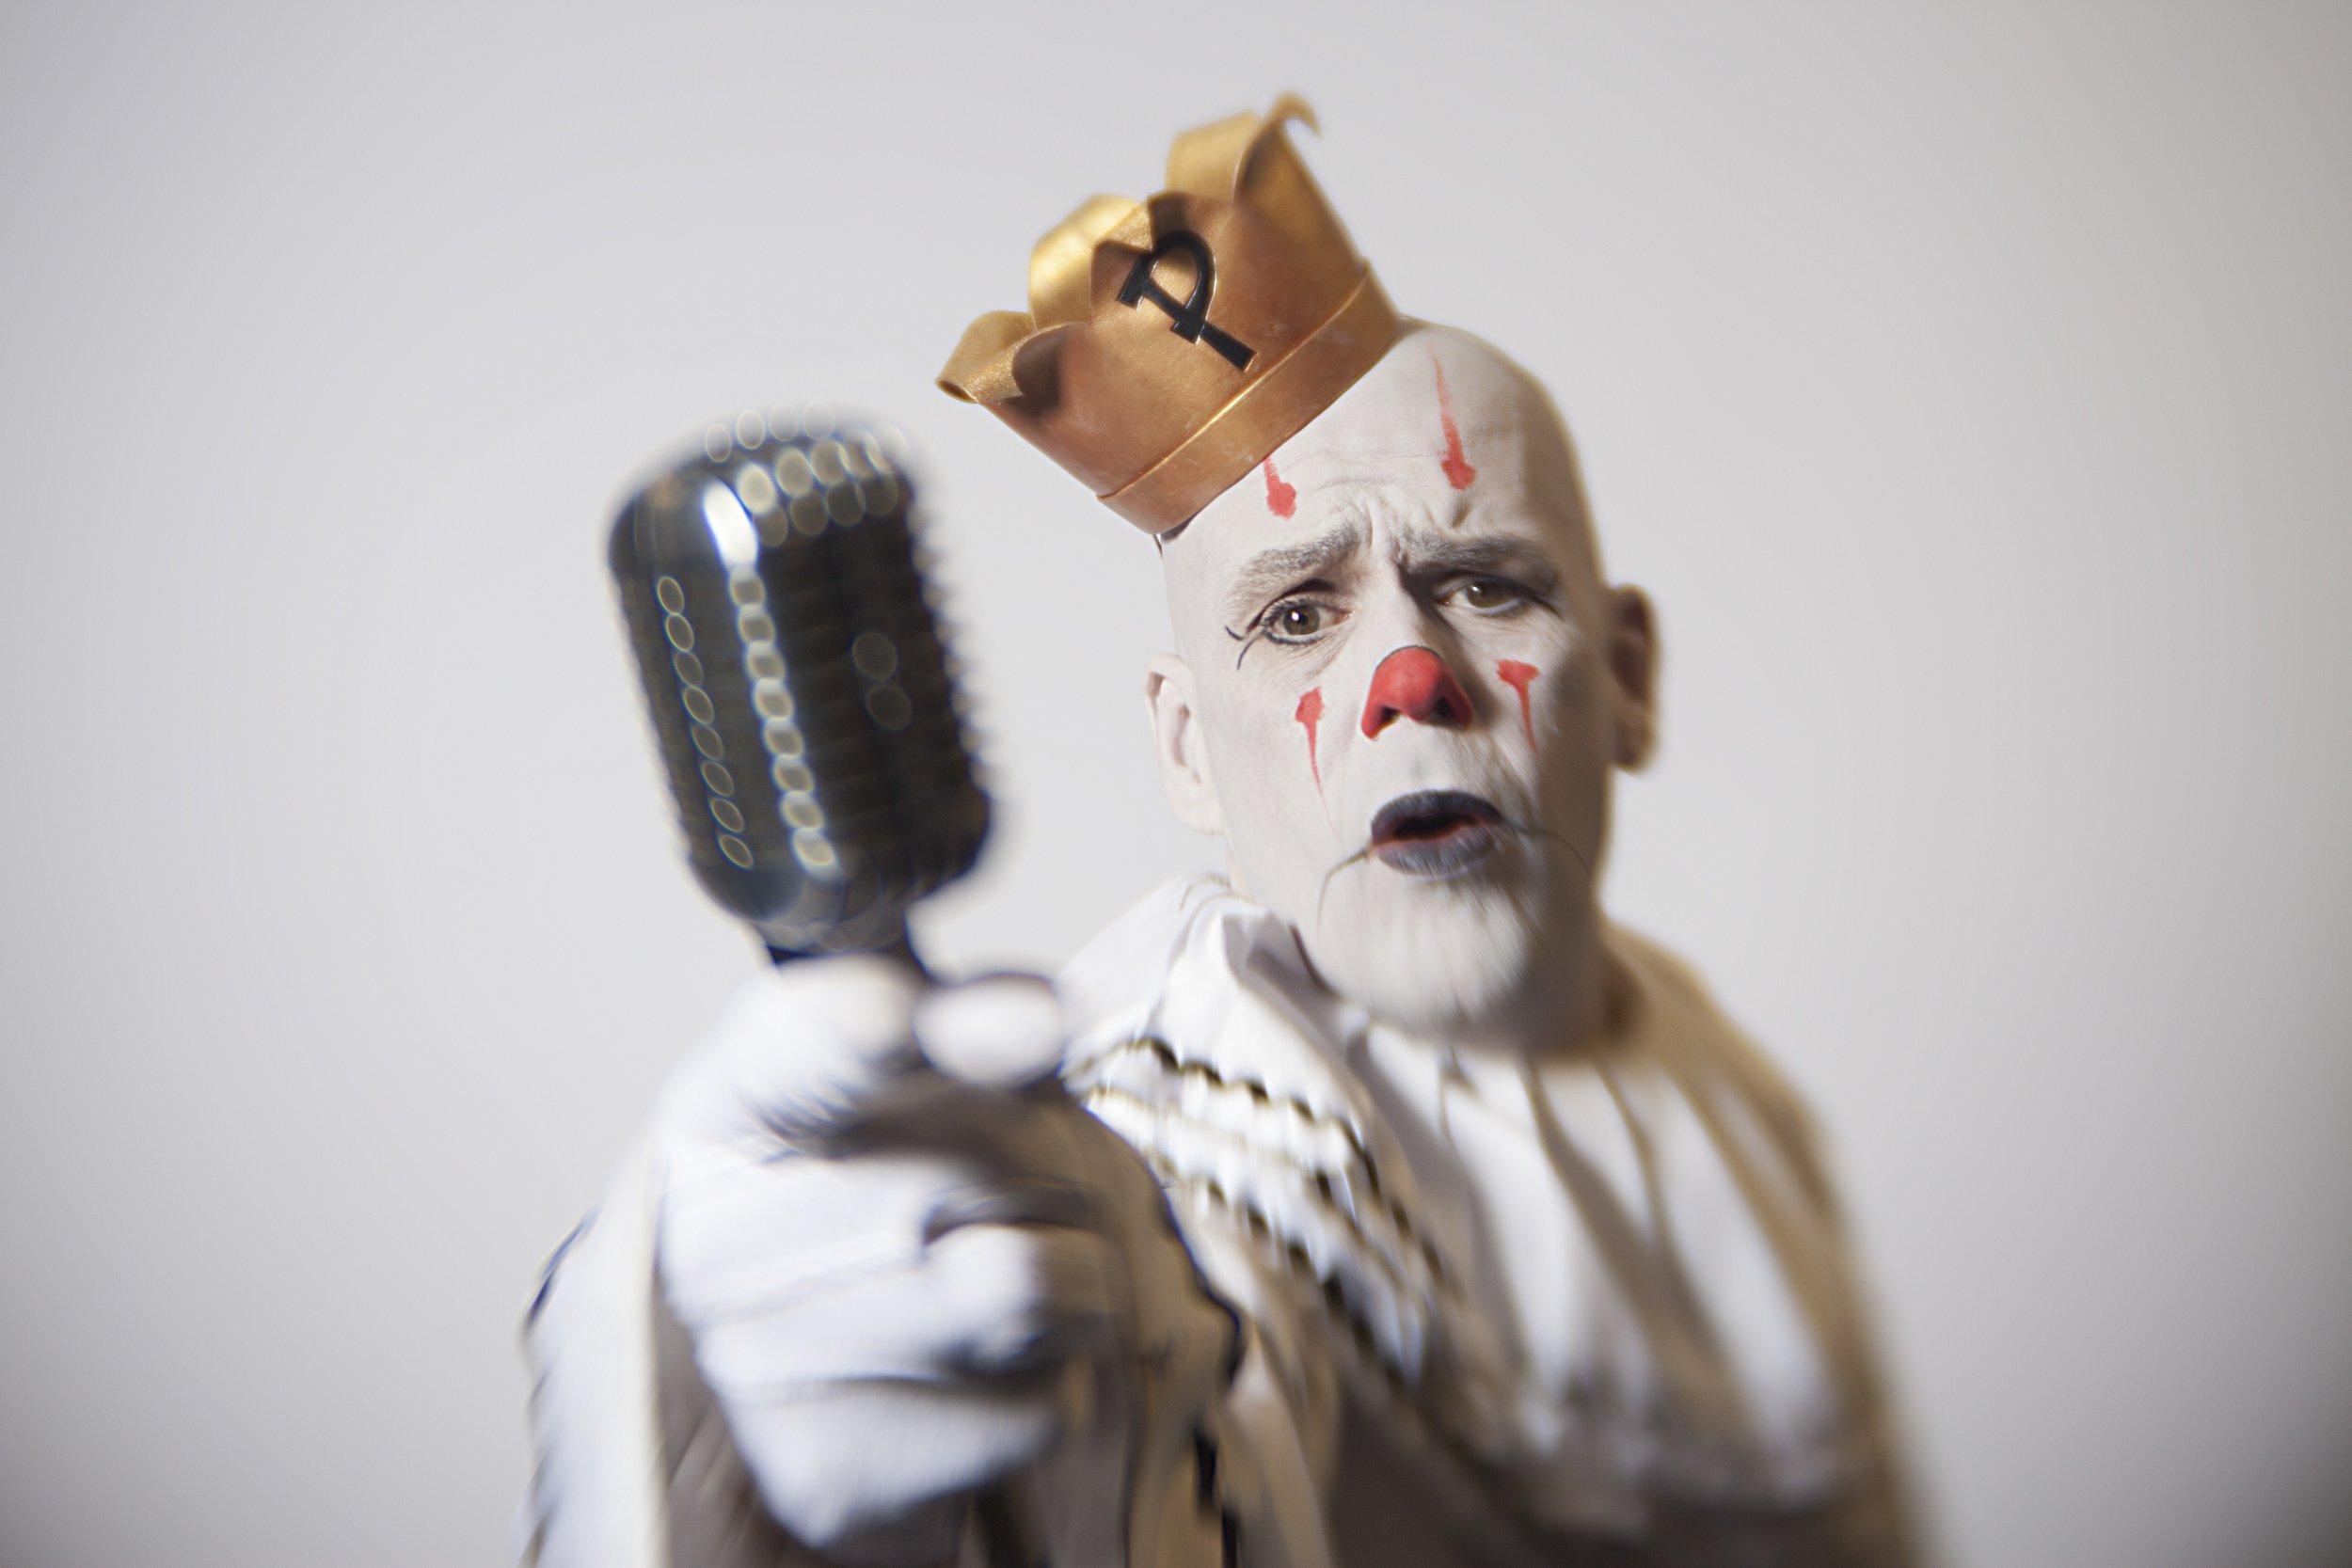 Puddles-microphone-hi-res4-25-17 copy.jpg